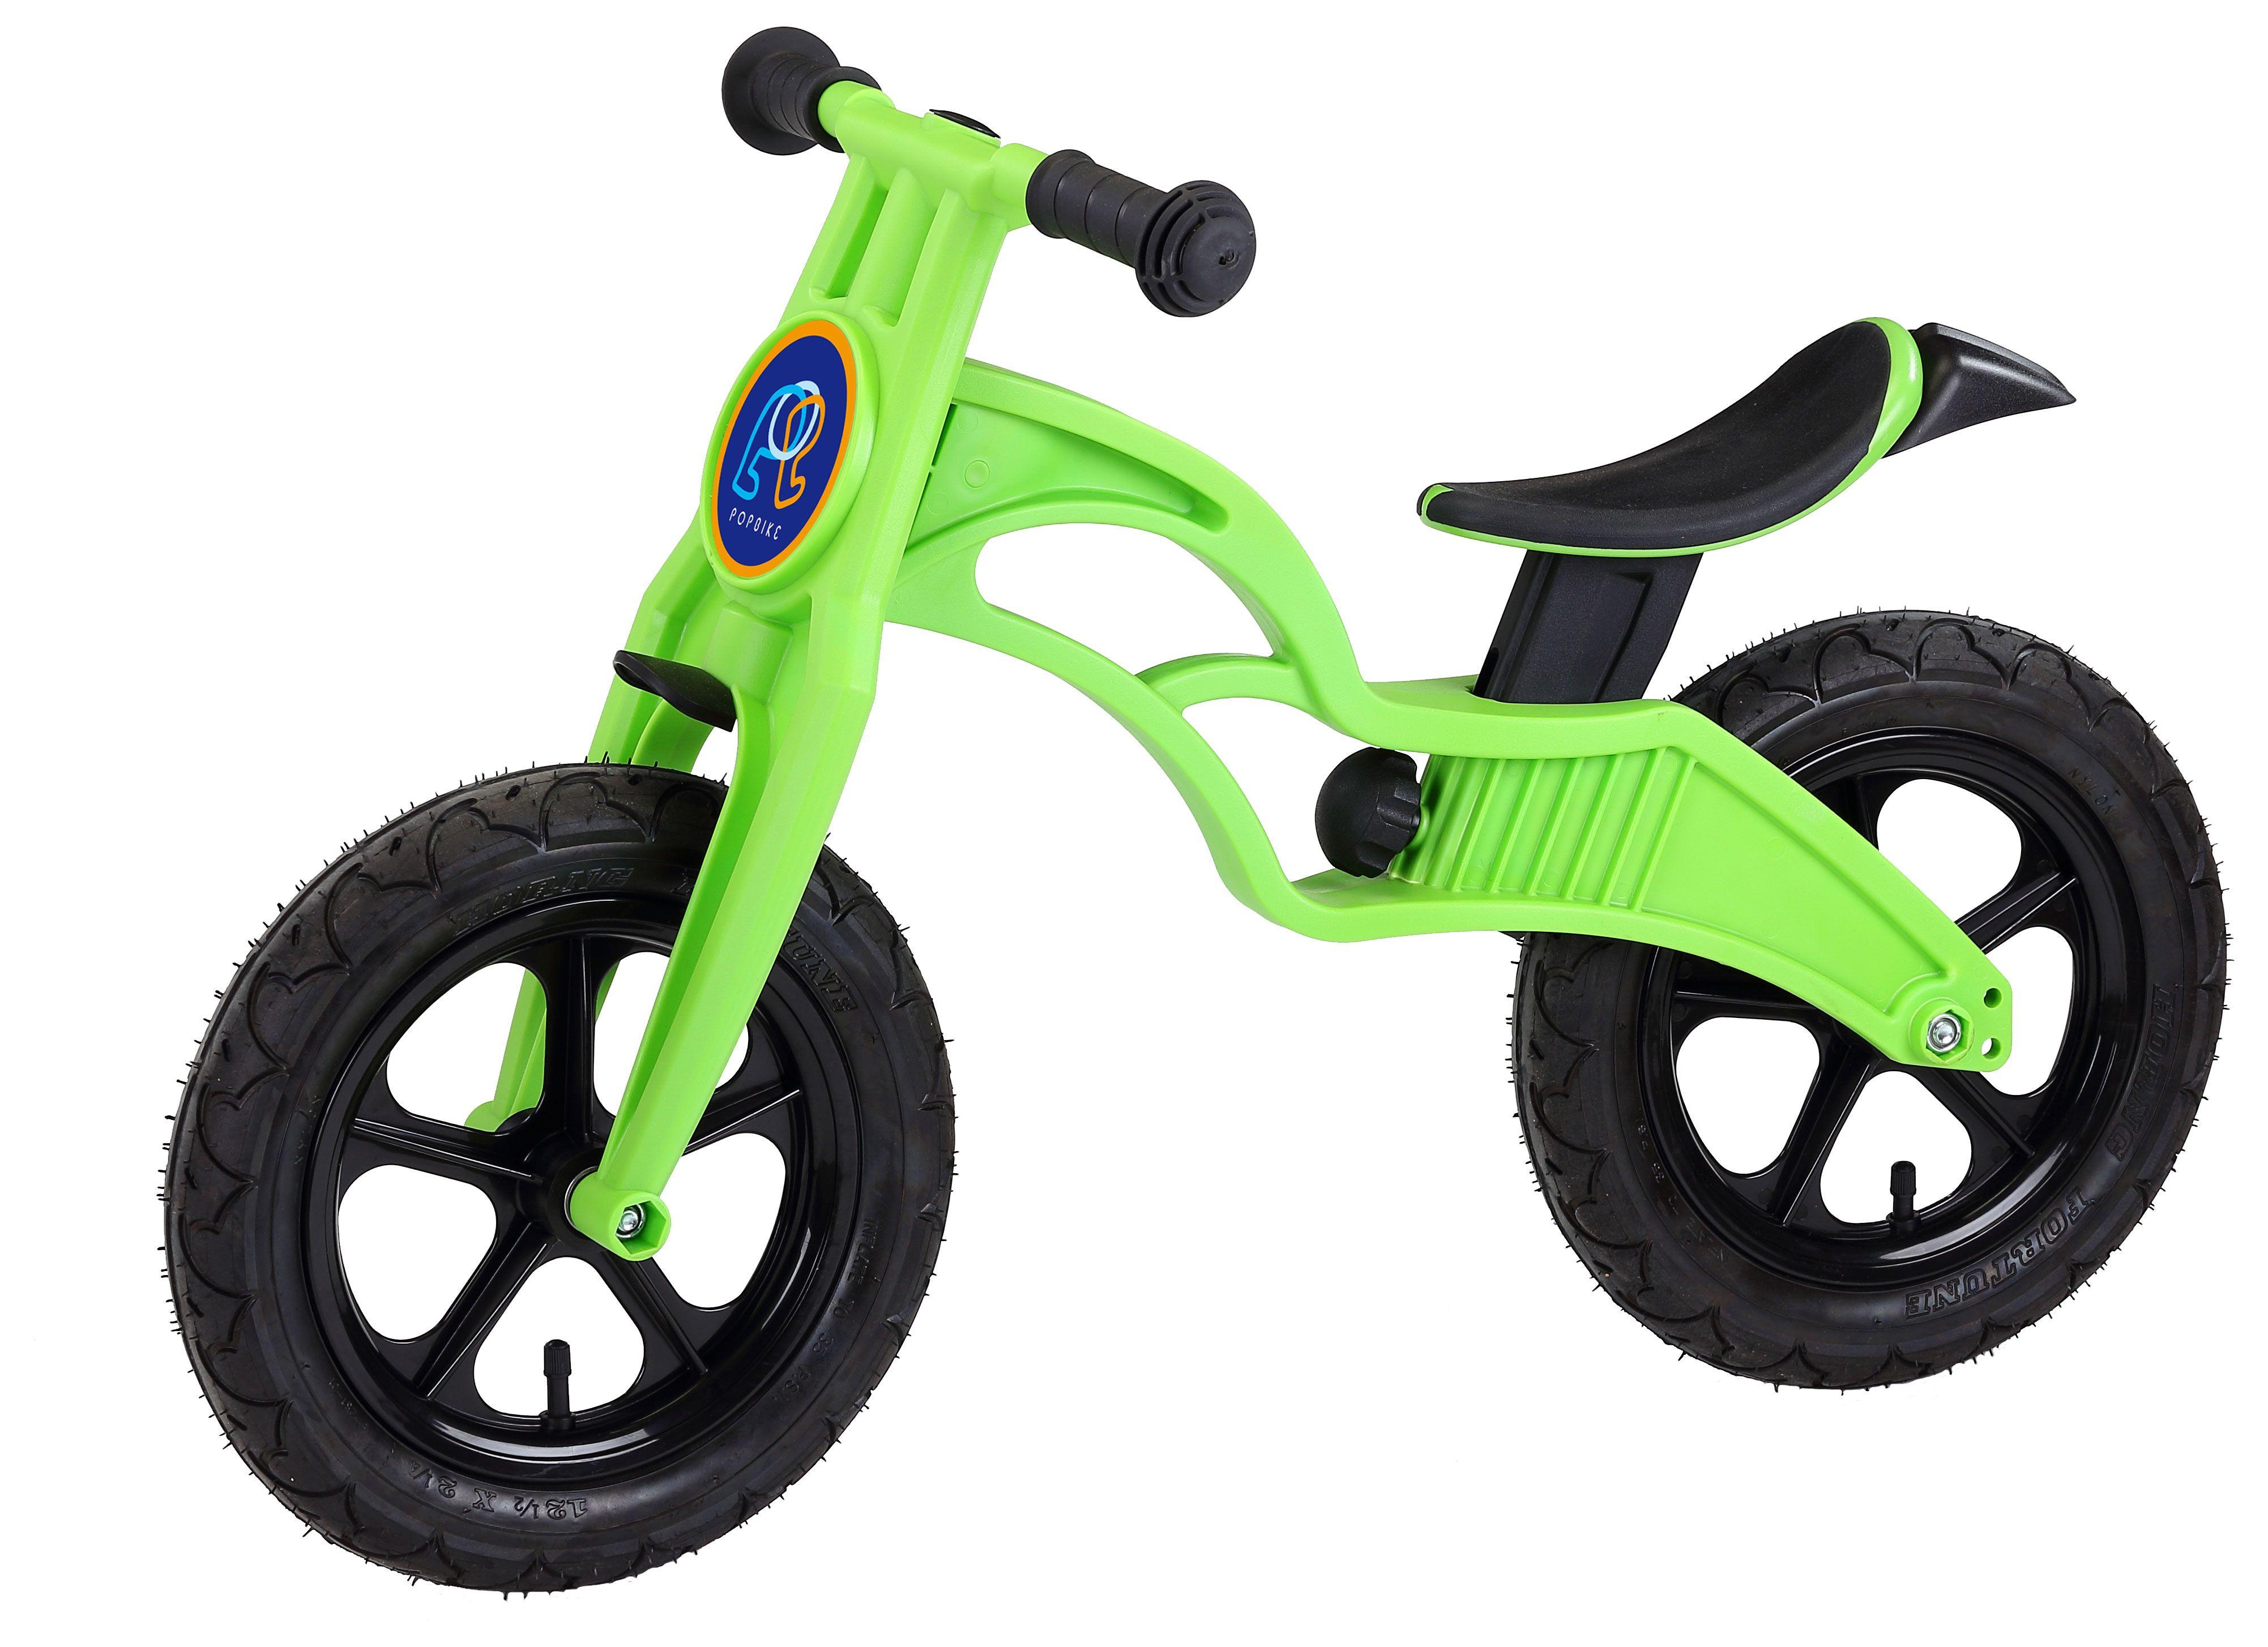 Велосипед Pop BikeДетские<br><br><br>year: 2016<br>цвет: оранжевый<br>пол: мальчик<br>тип тормозов: без тормозов<br>диаметр колеса: 12<br>тип рамы: хардтейл<br>материал рамы: пластик<br>количество скоростей: 1